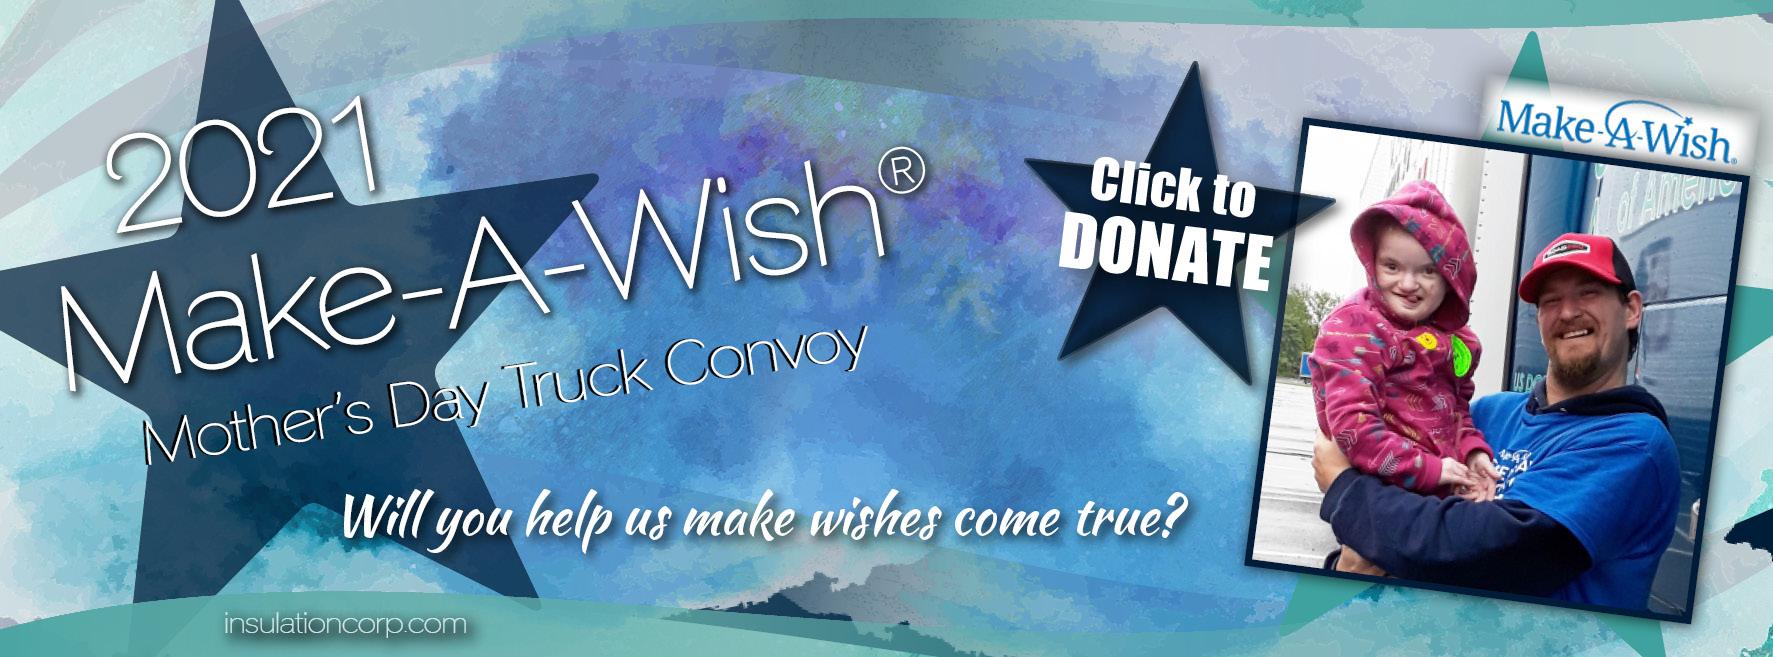 2021 Make-A-Wish Truck Convoy